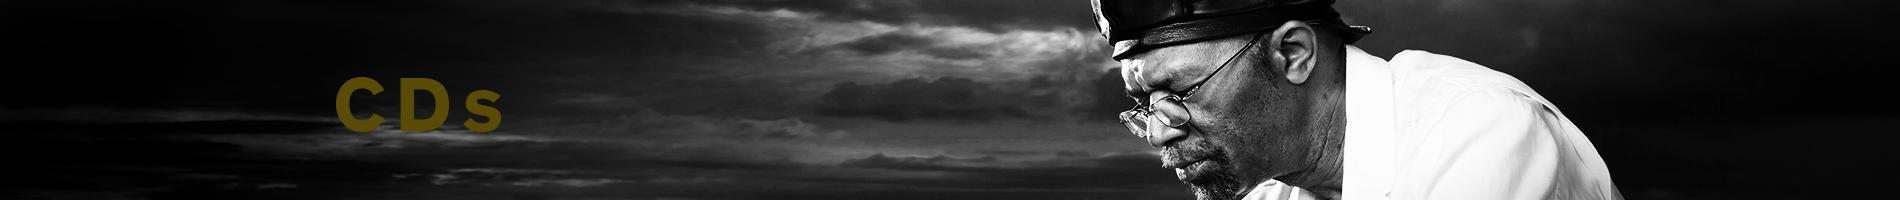 beres-banner-vp-reggaecds-1900x200.png